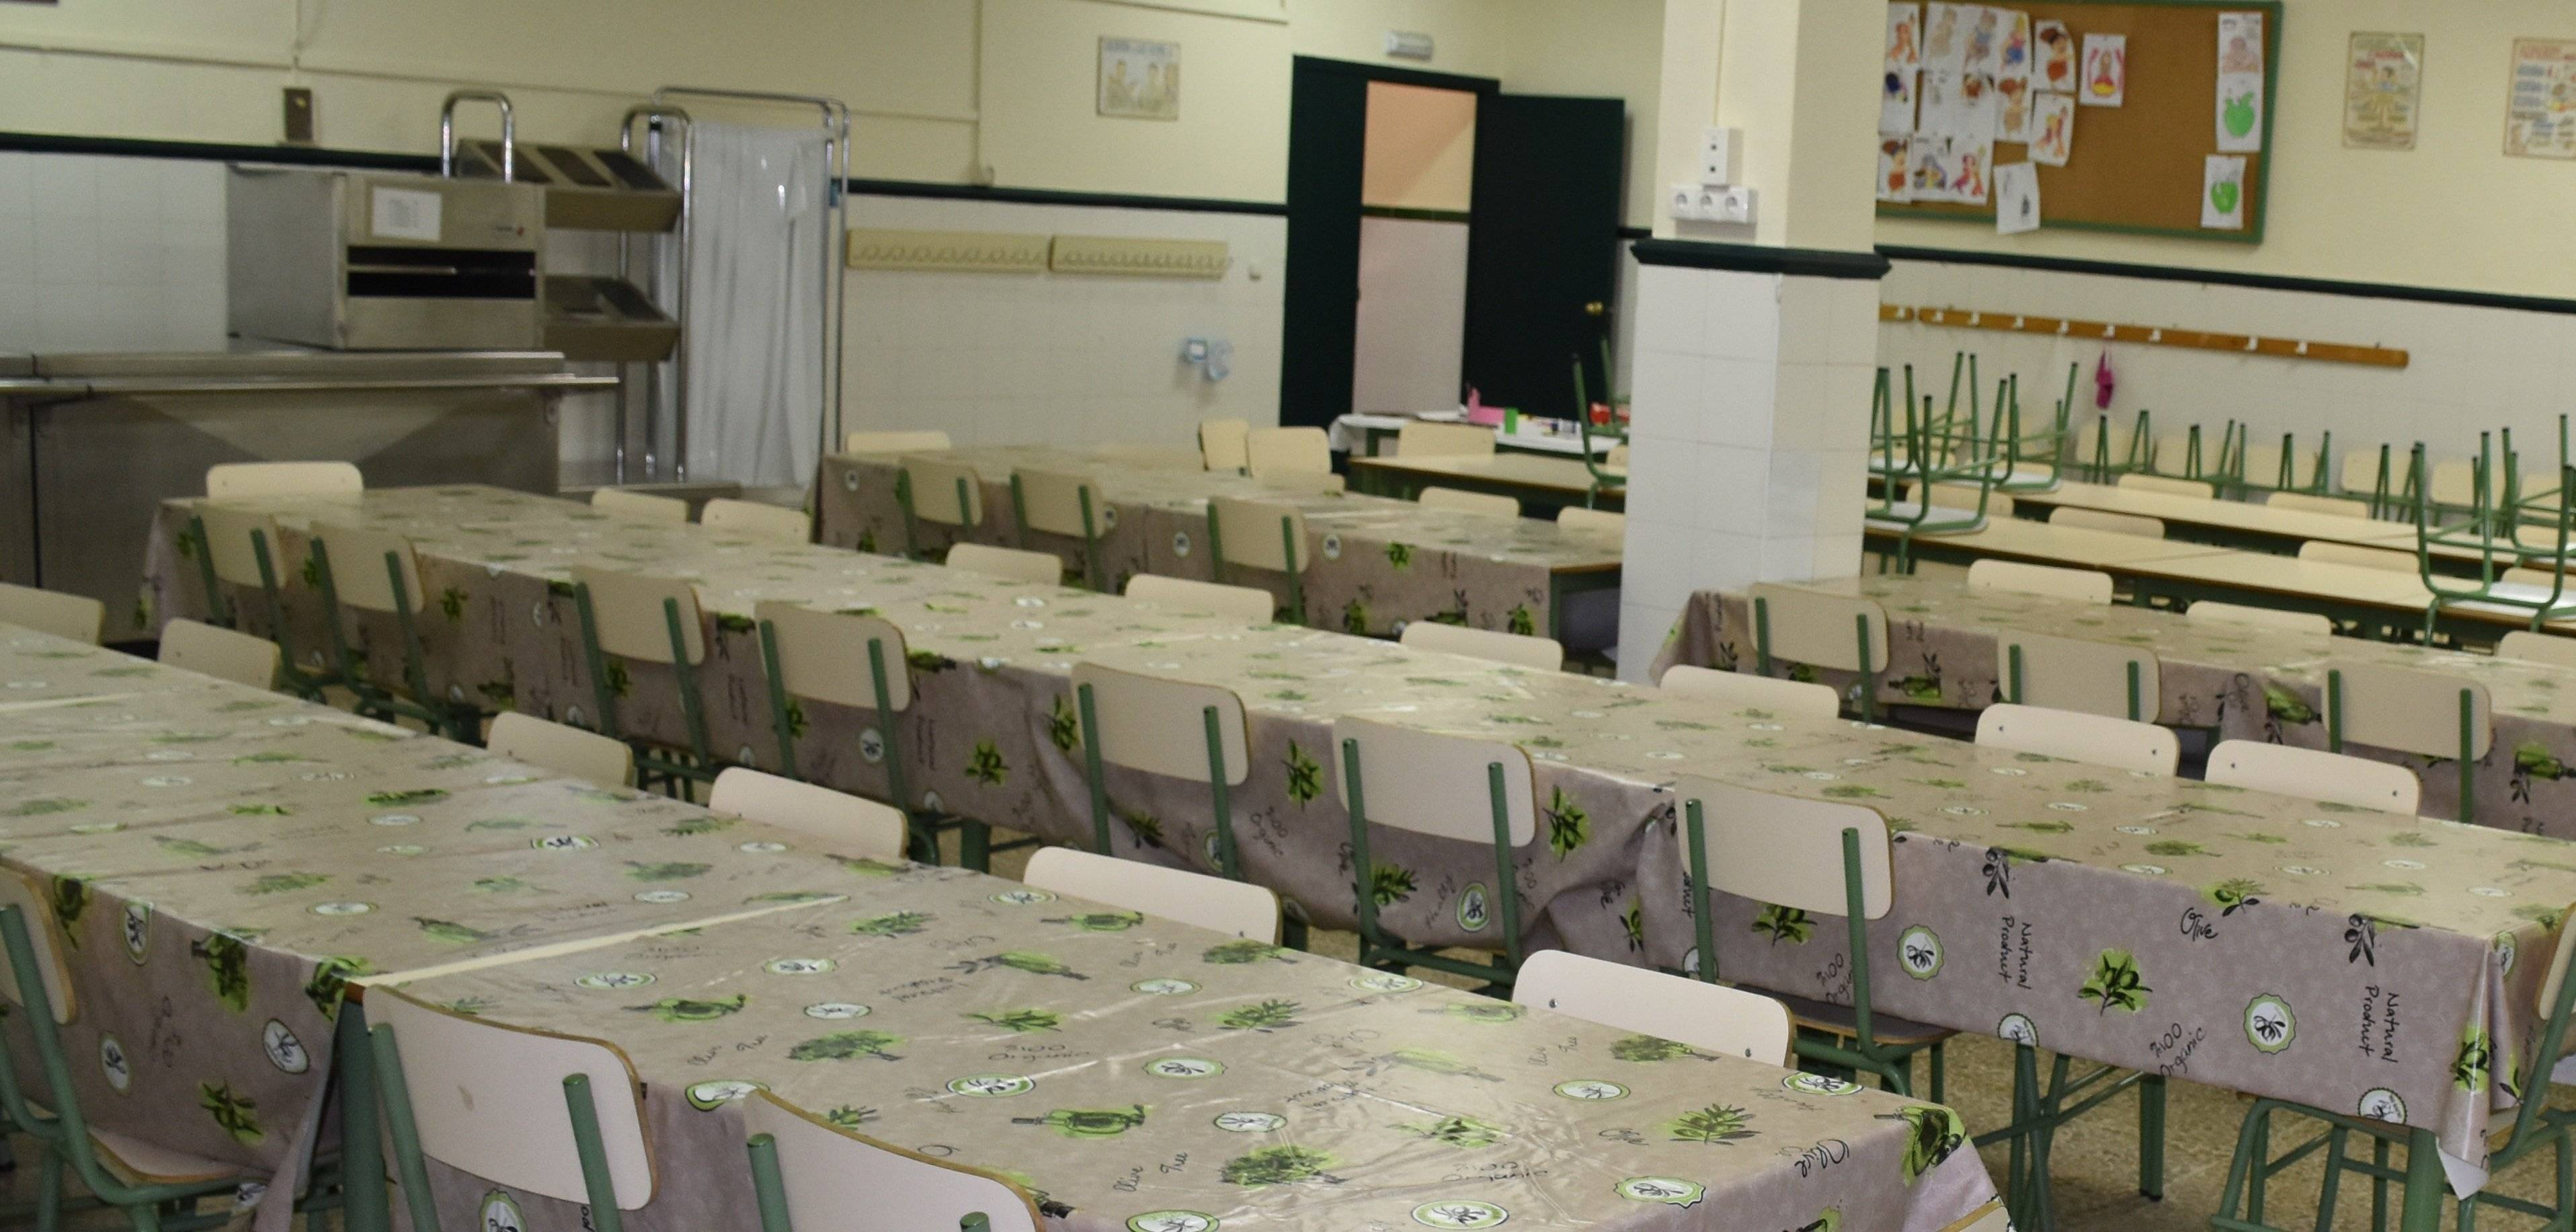 El Ministerio oferta 780 becas de comedor para el próximo curso